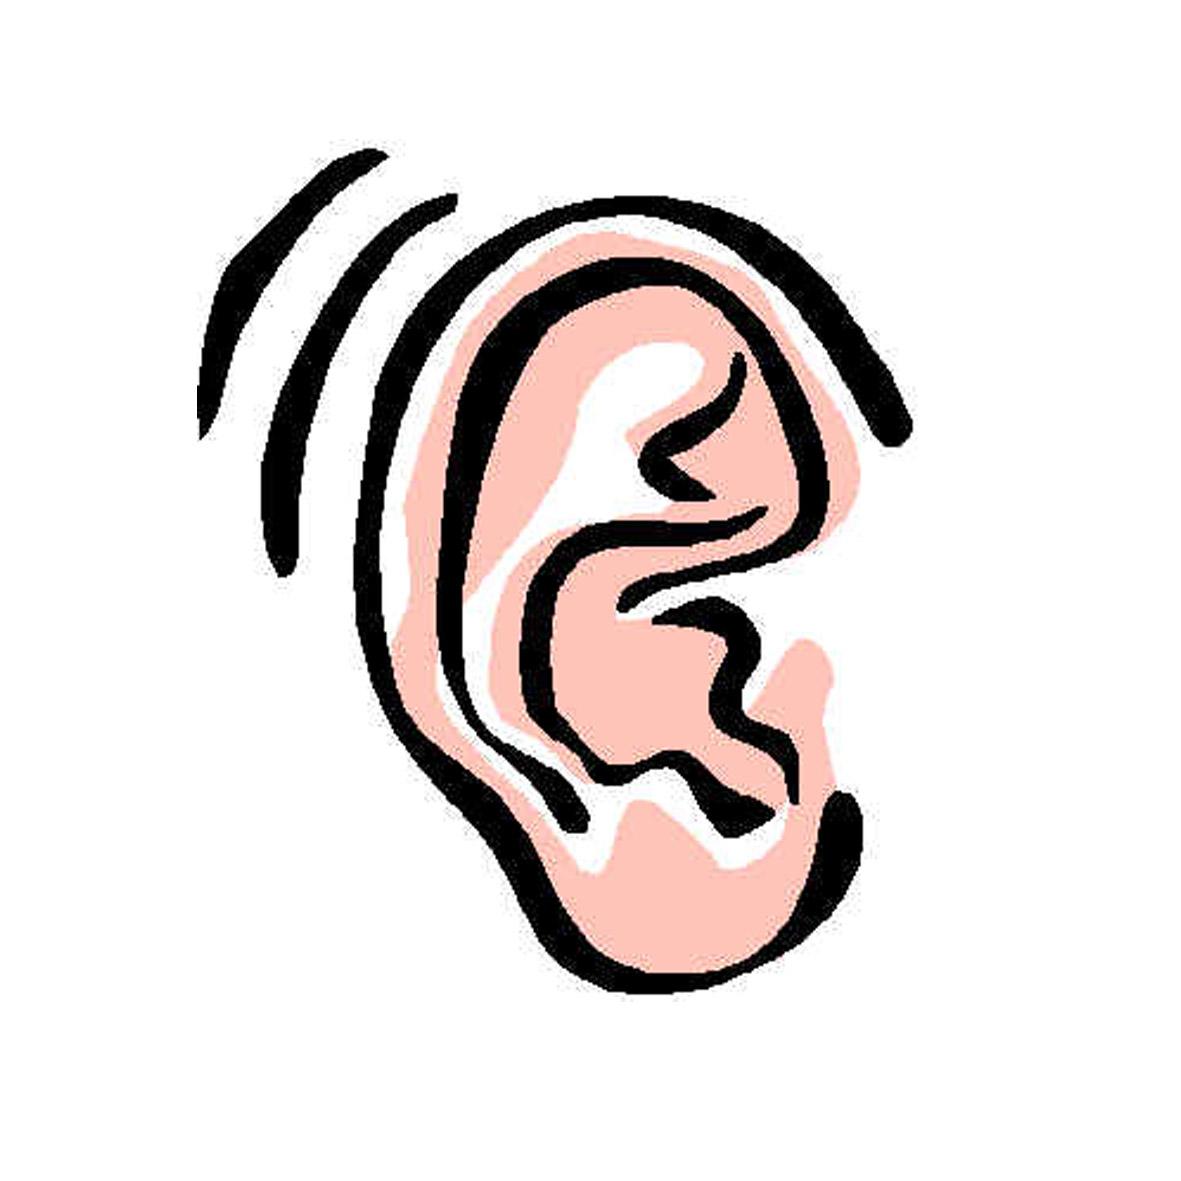 listener-clipart-Active_Listening.jpg